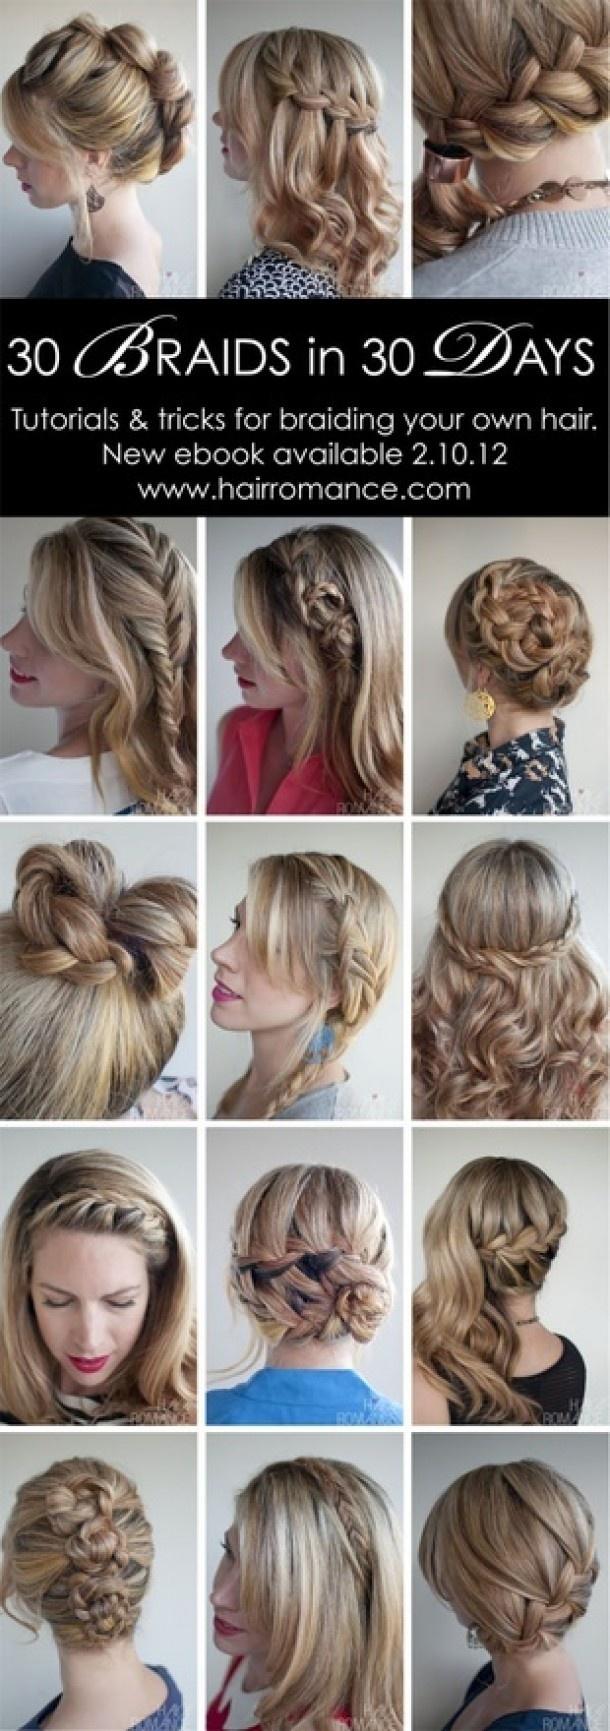 best hair hair freakinu hair images on pinterest make up